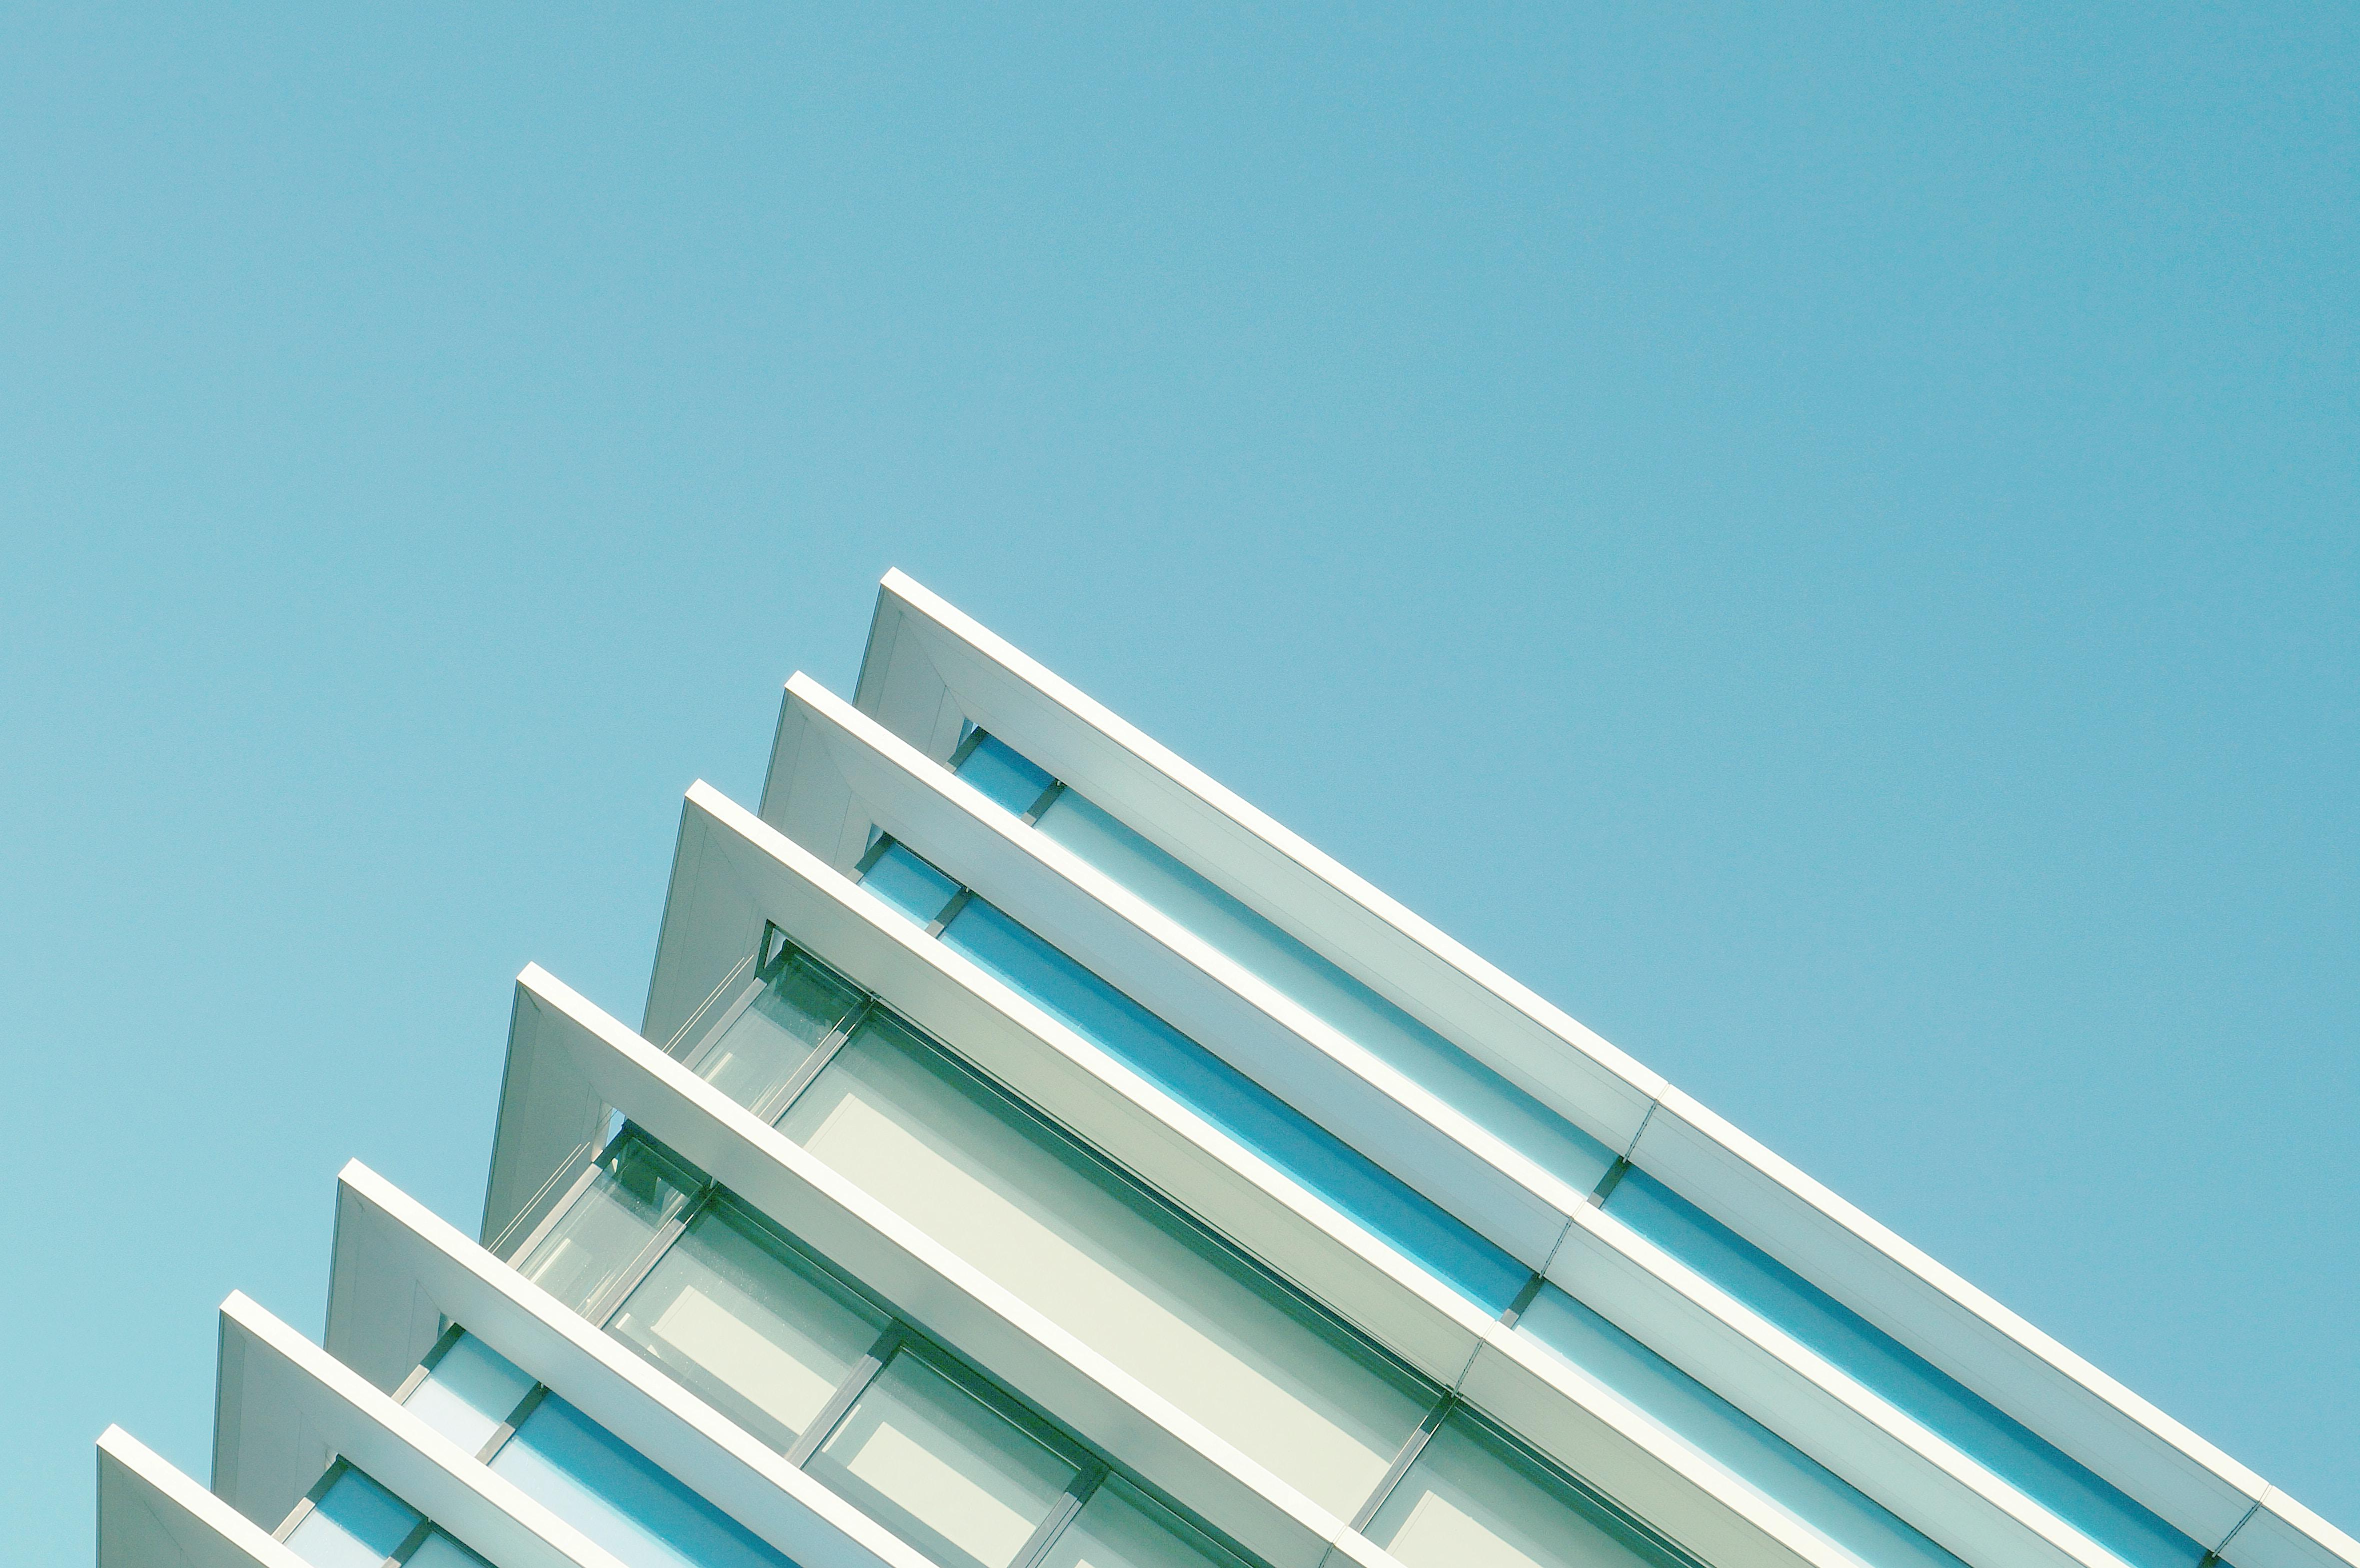 The top edge of a modern building in Aarhus, Denmark against a blue sky